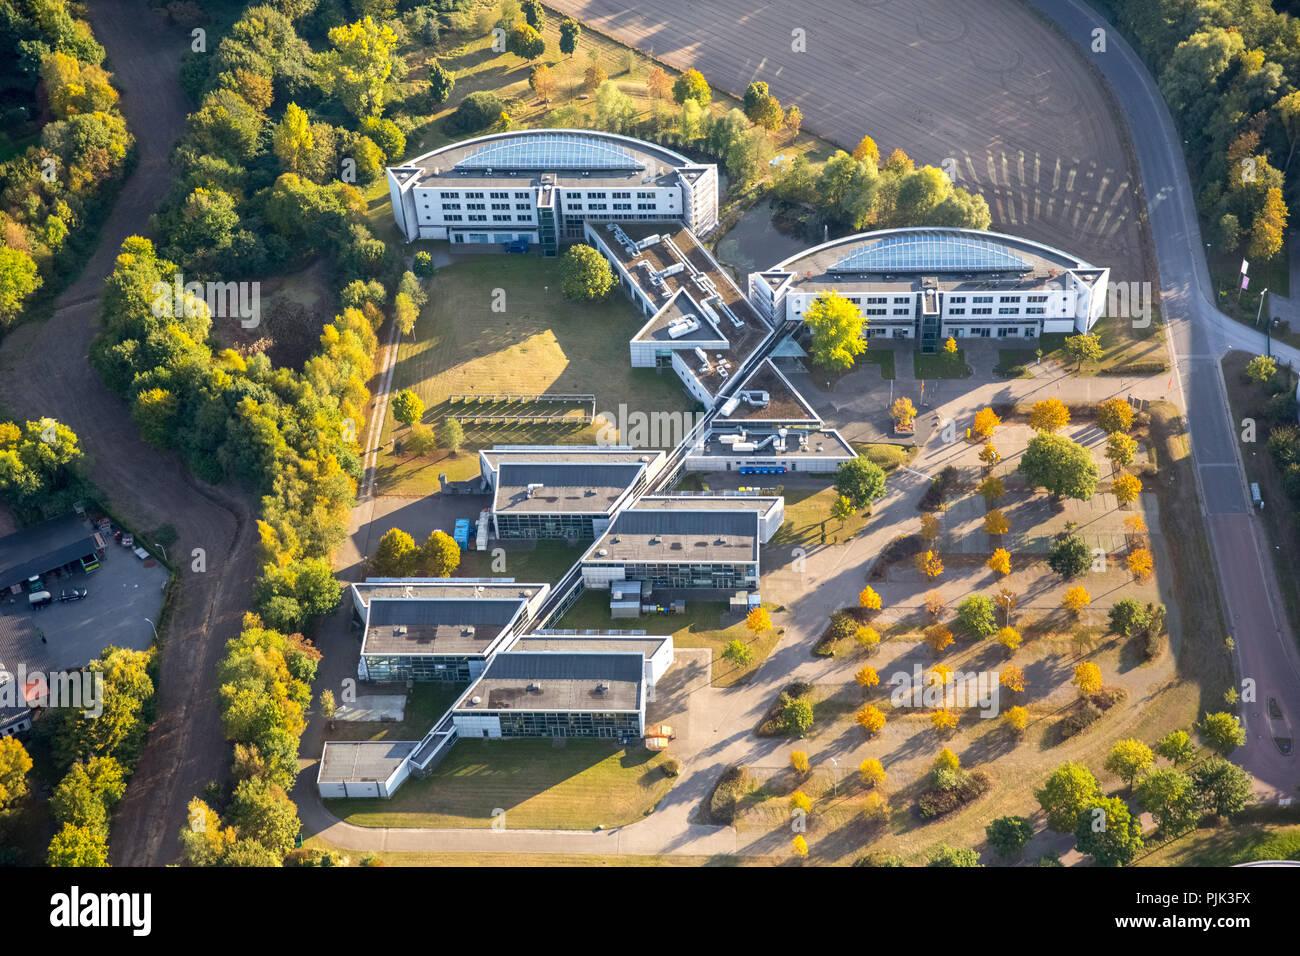 Aerial view, Gladbeck, Ruhr area, North Rhine-Westphalia, Germany - Stock Image